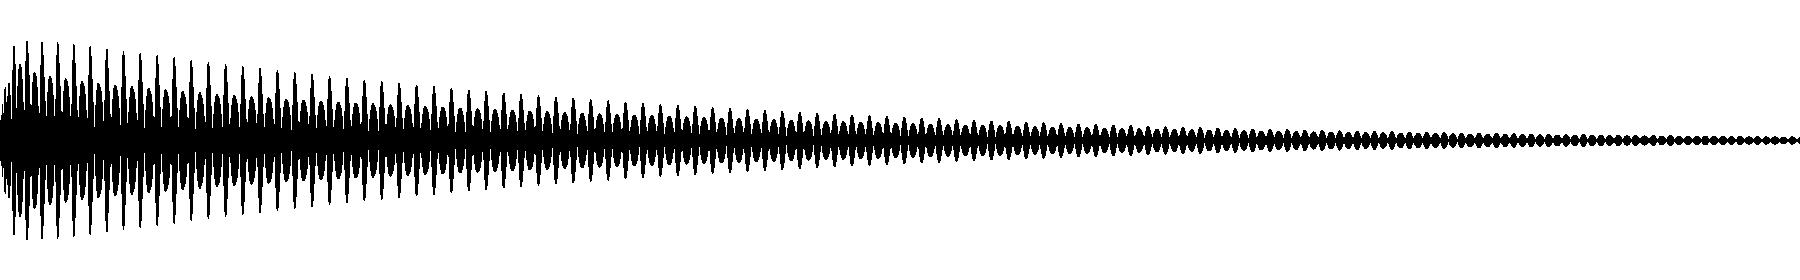 mb 808 40